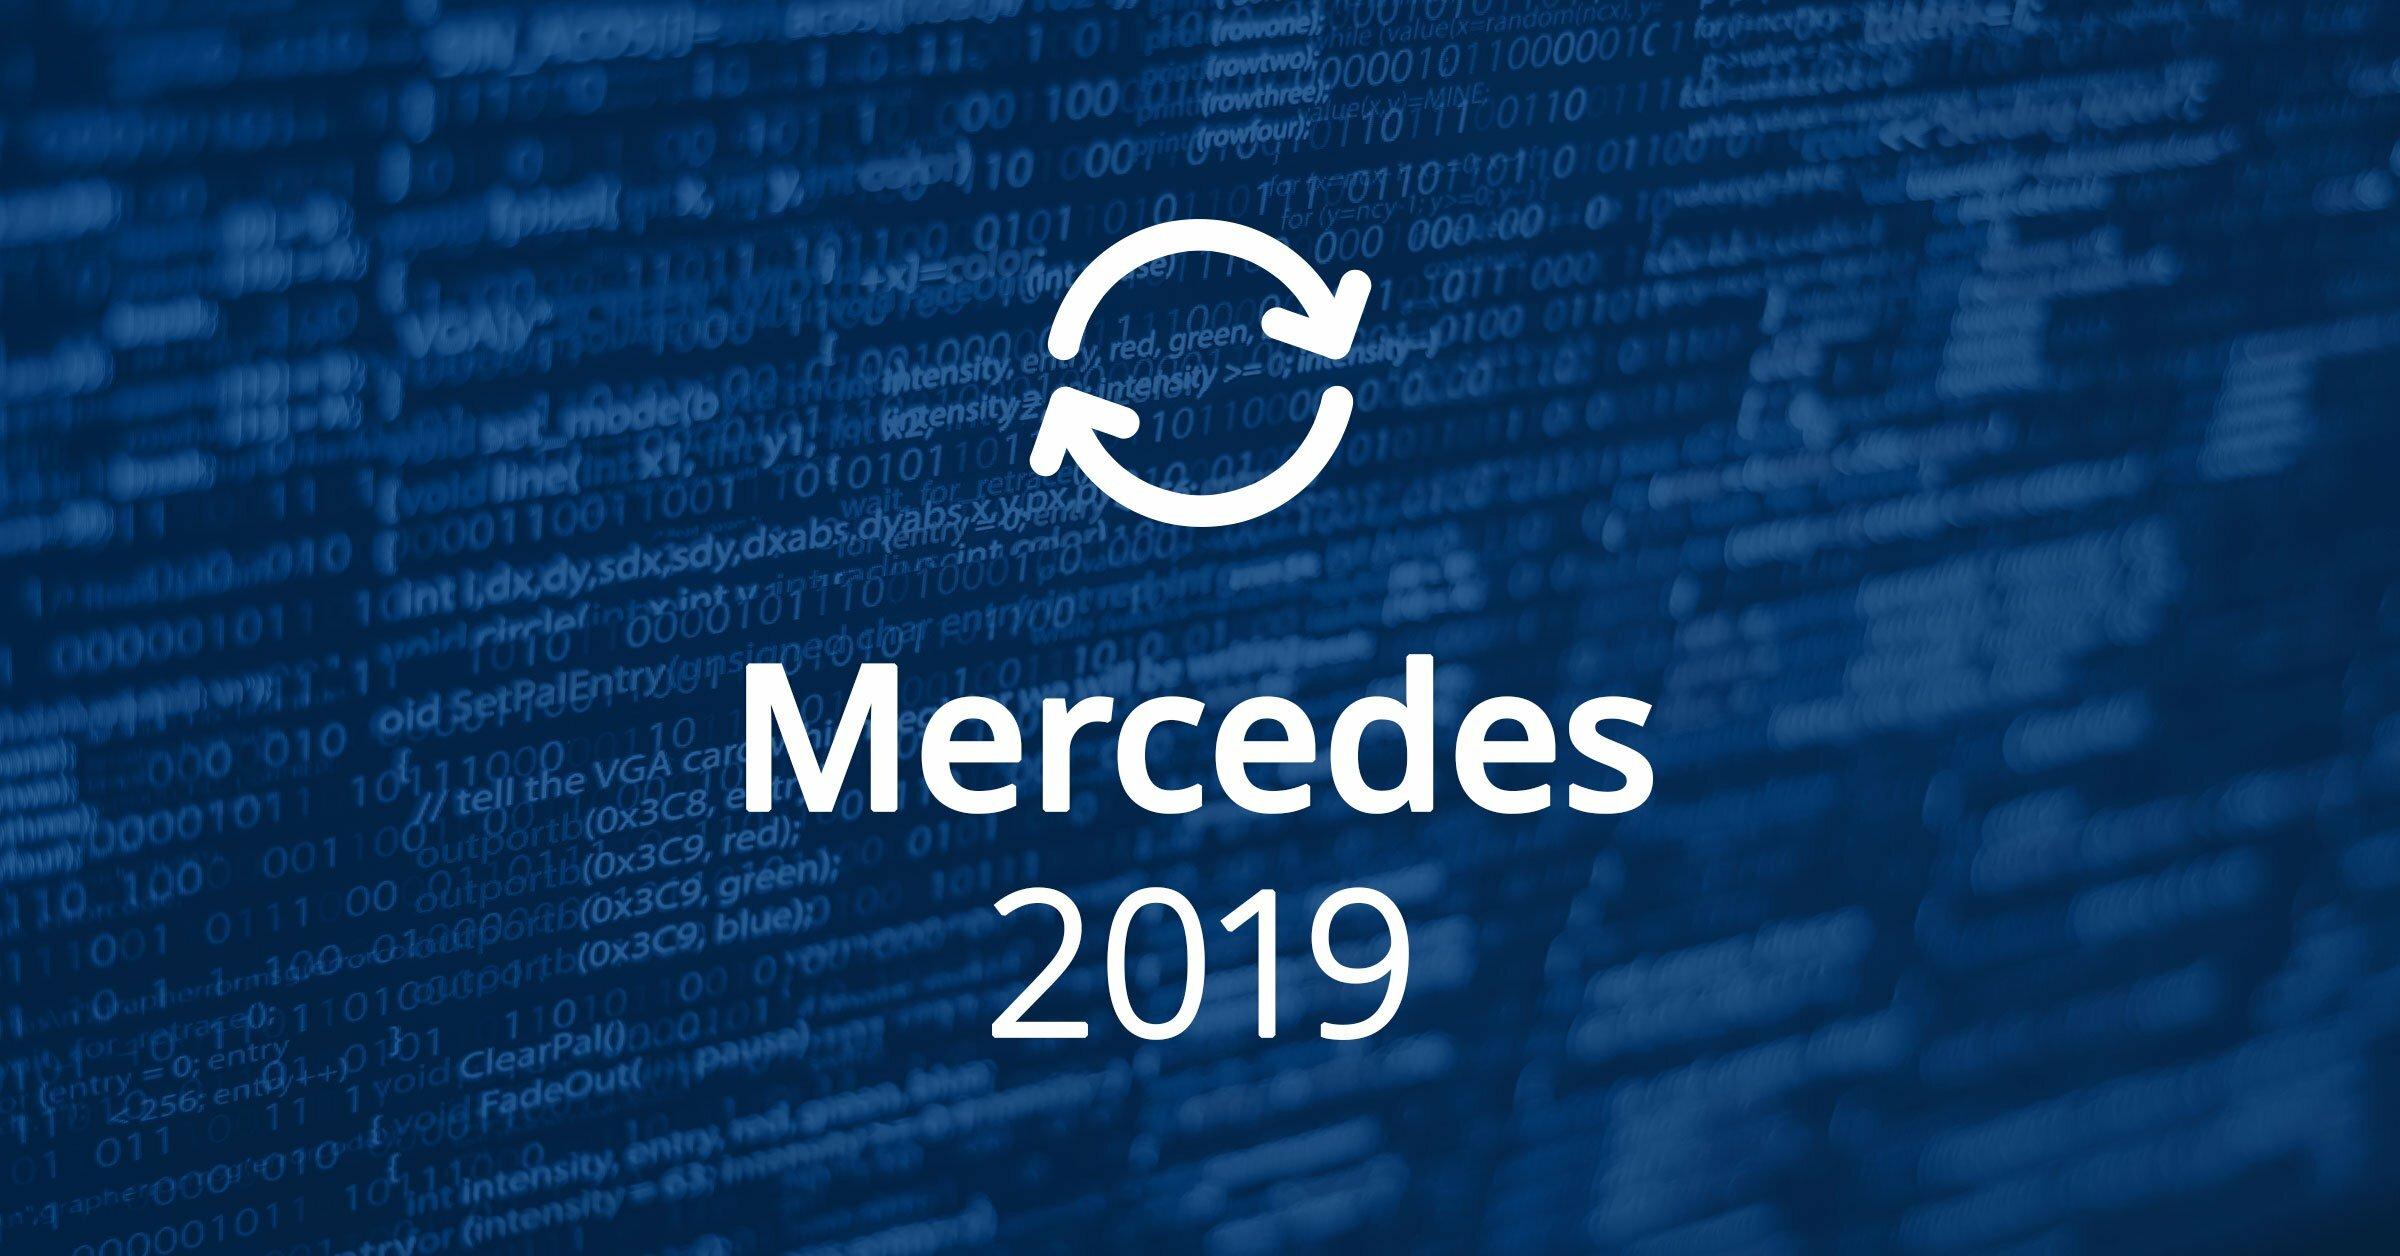 Mercedes Software Updates 2019